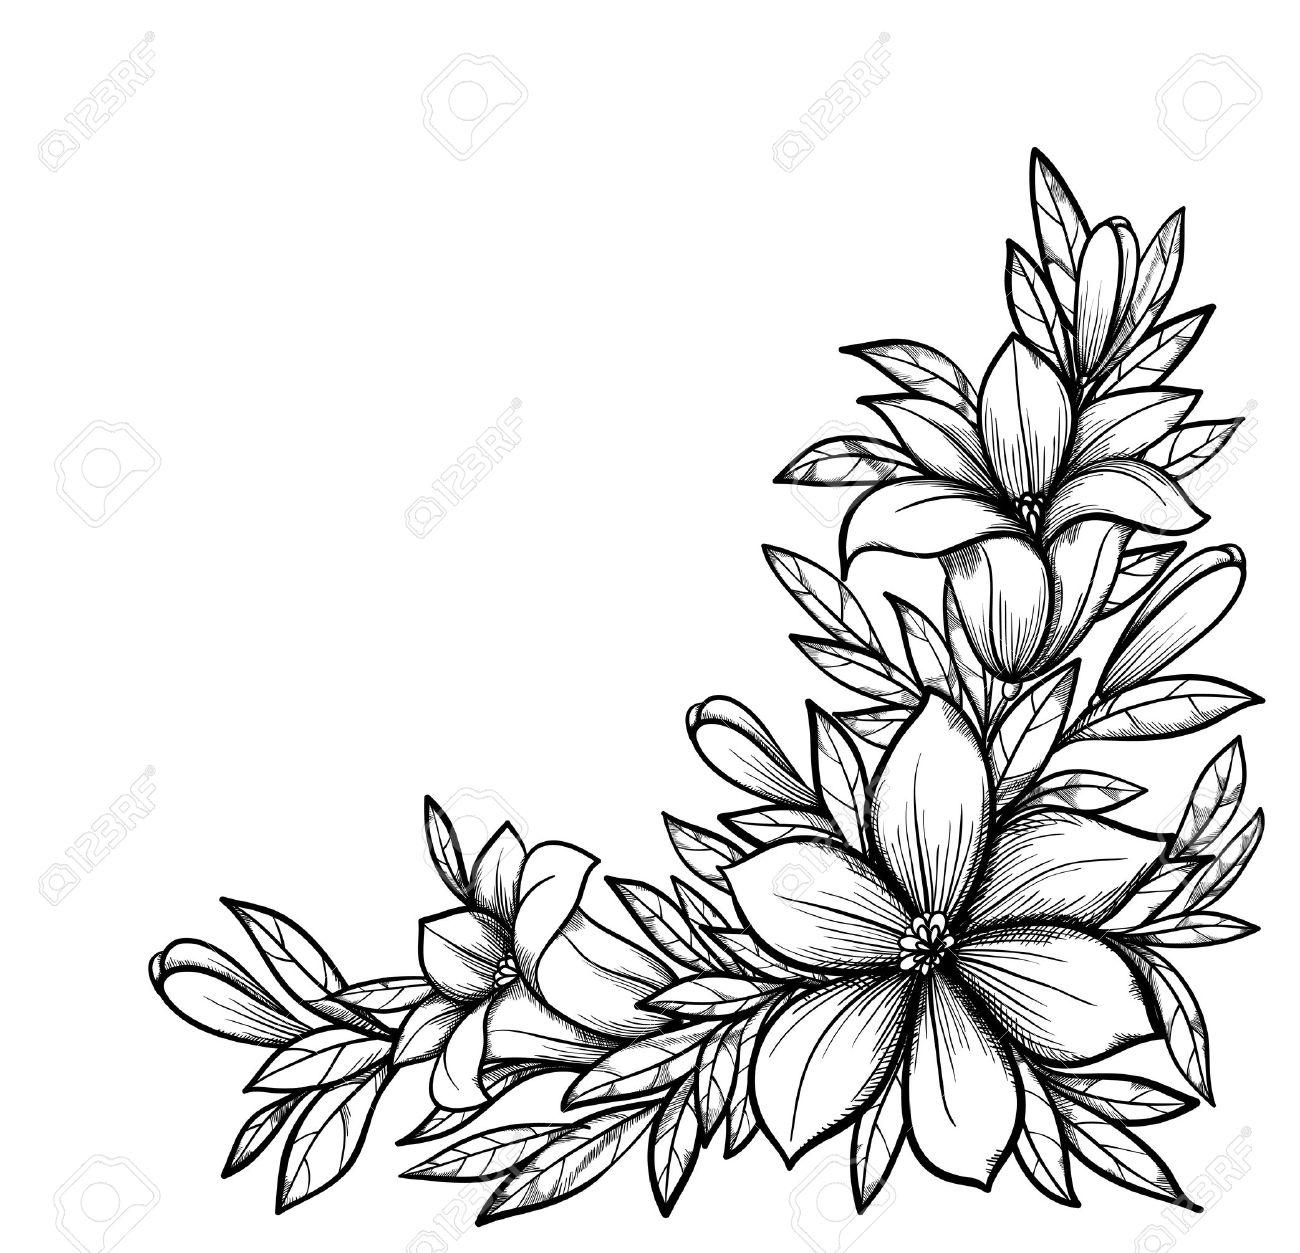 Fresco Dibujos De Guirnaldas De Flores Para Colorear